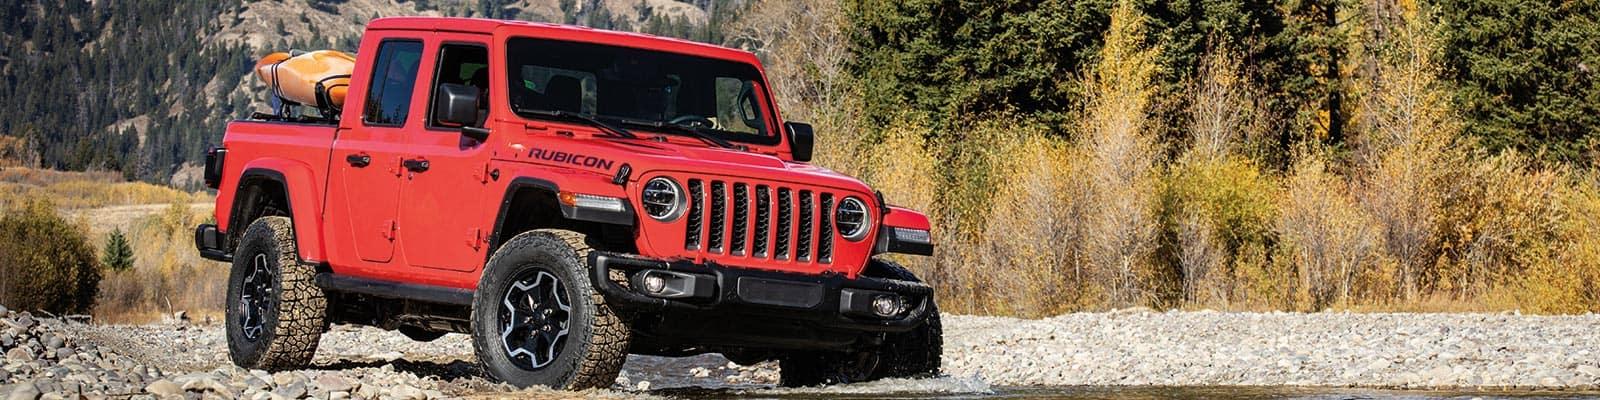 Jeep Gladiator Slide